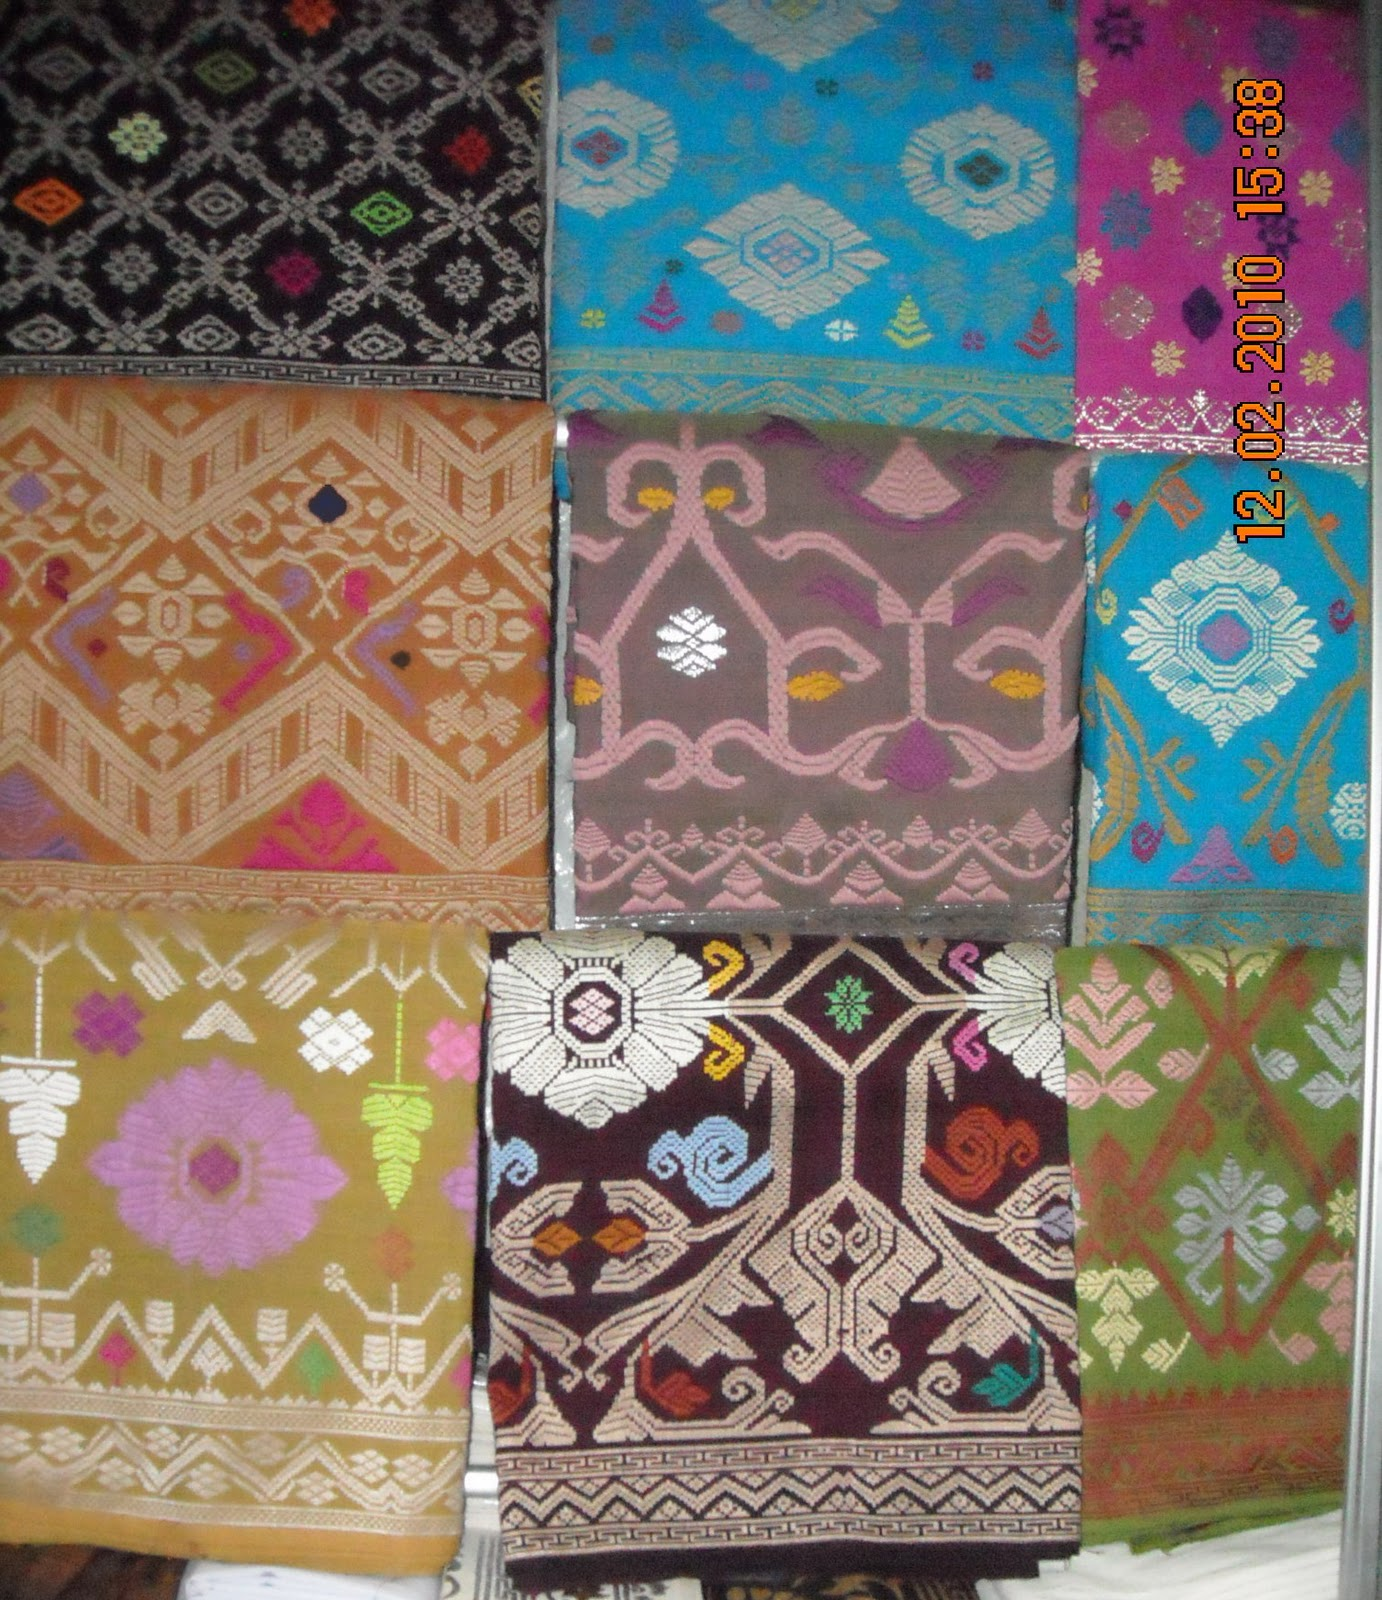 Koleksi Kain Bali | newhairstylesformen2014.com